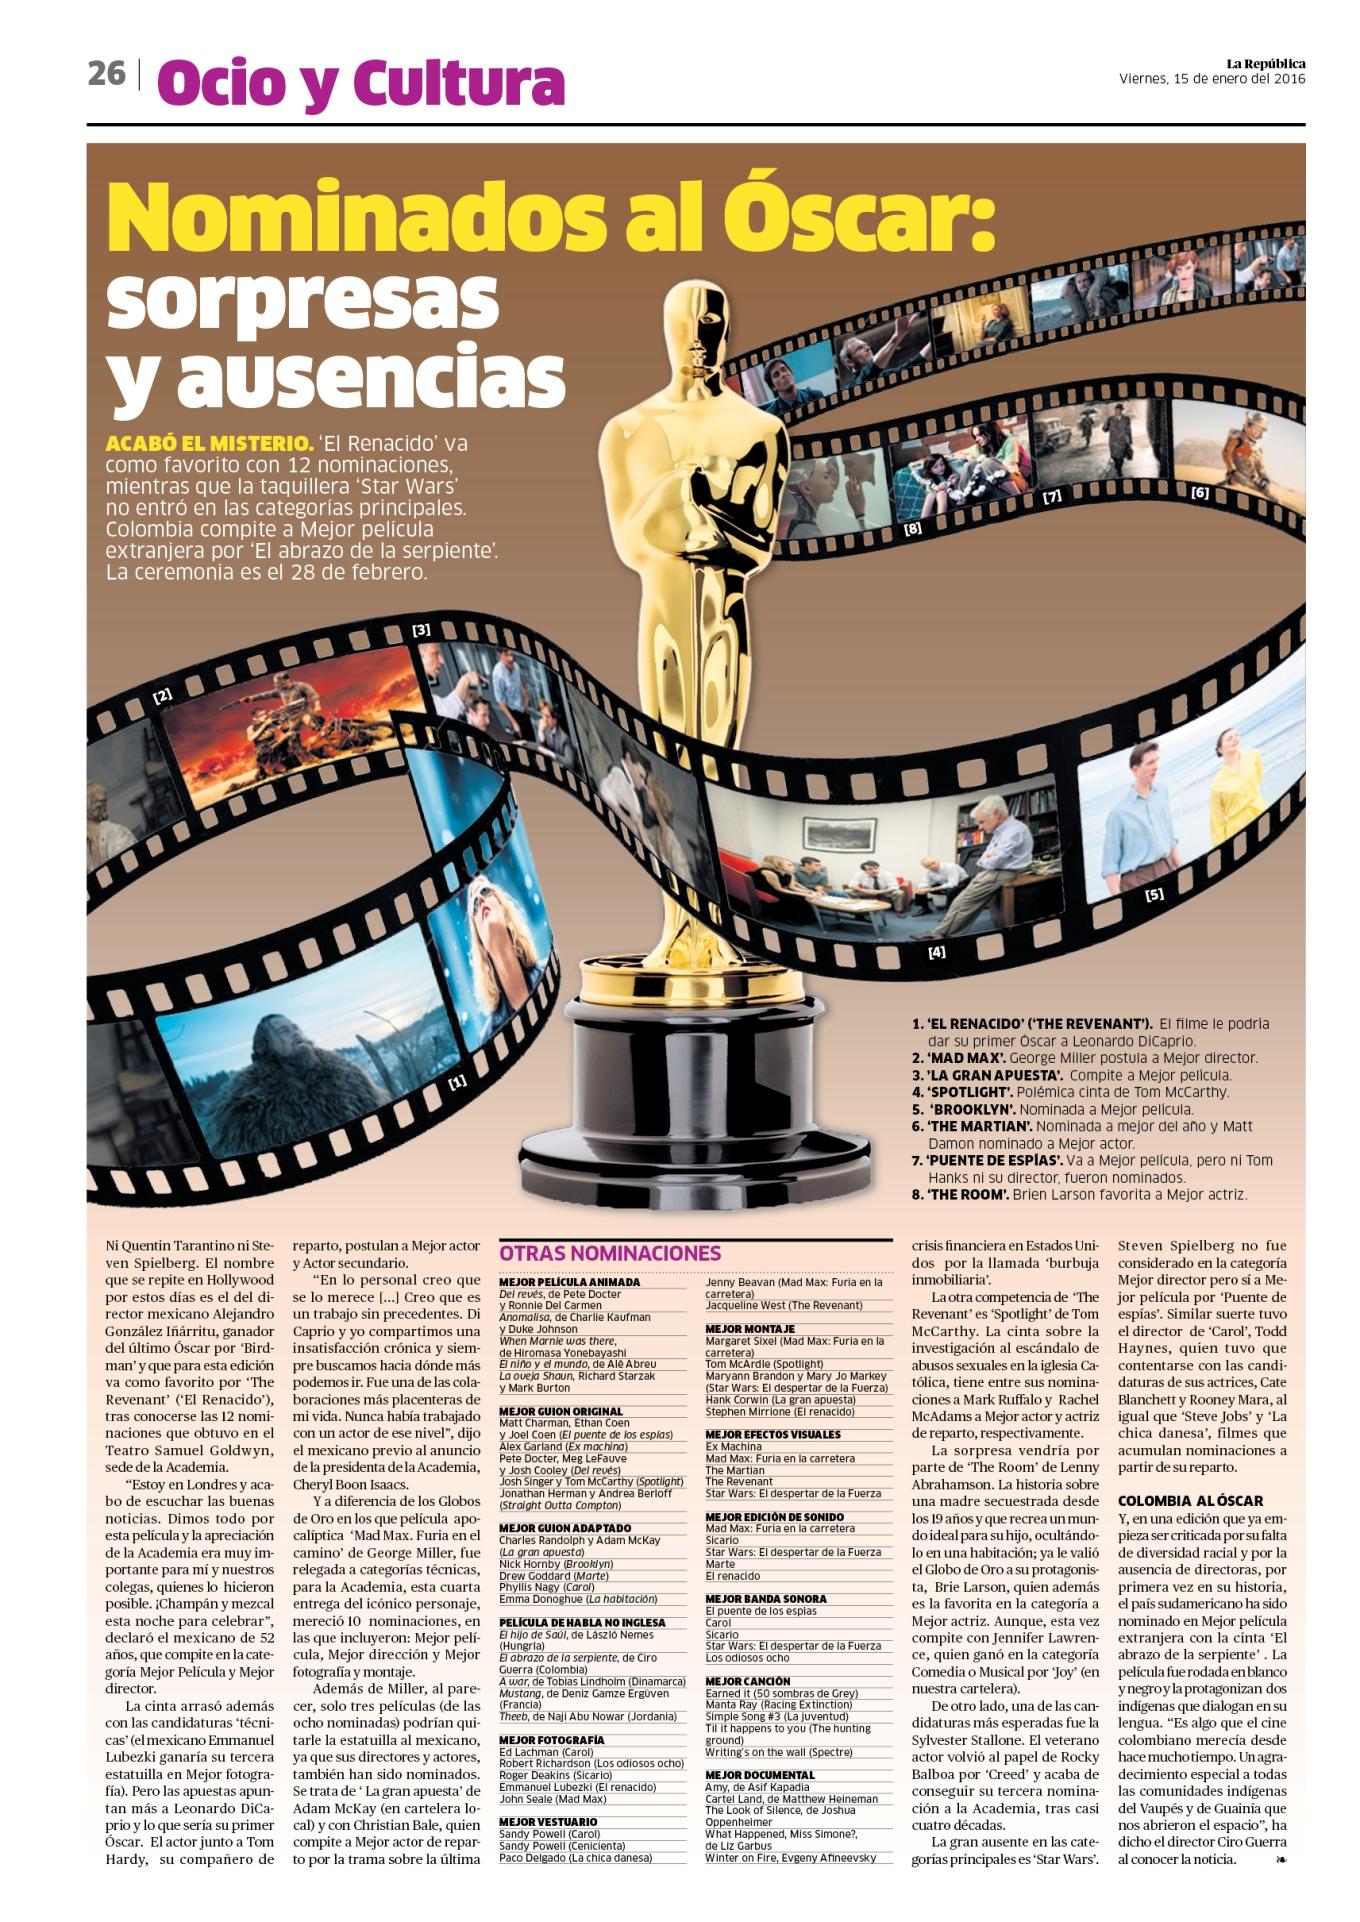 larepublica-ocio-fama-espectaculo-oscar-awards-joelnarvaez